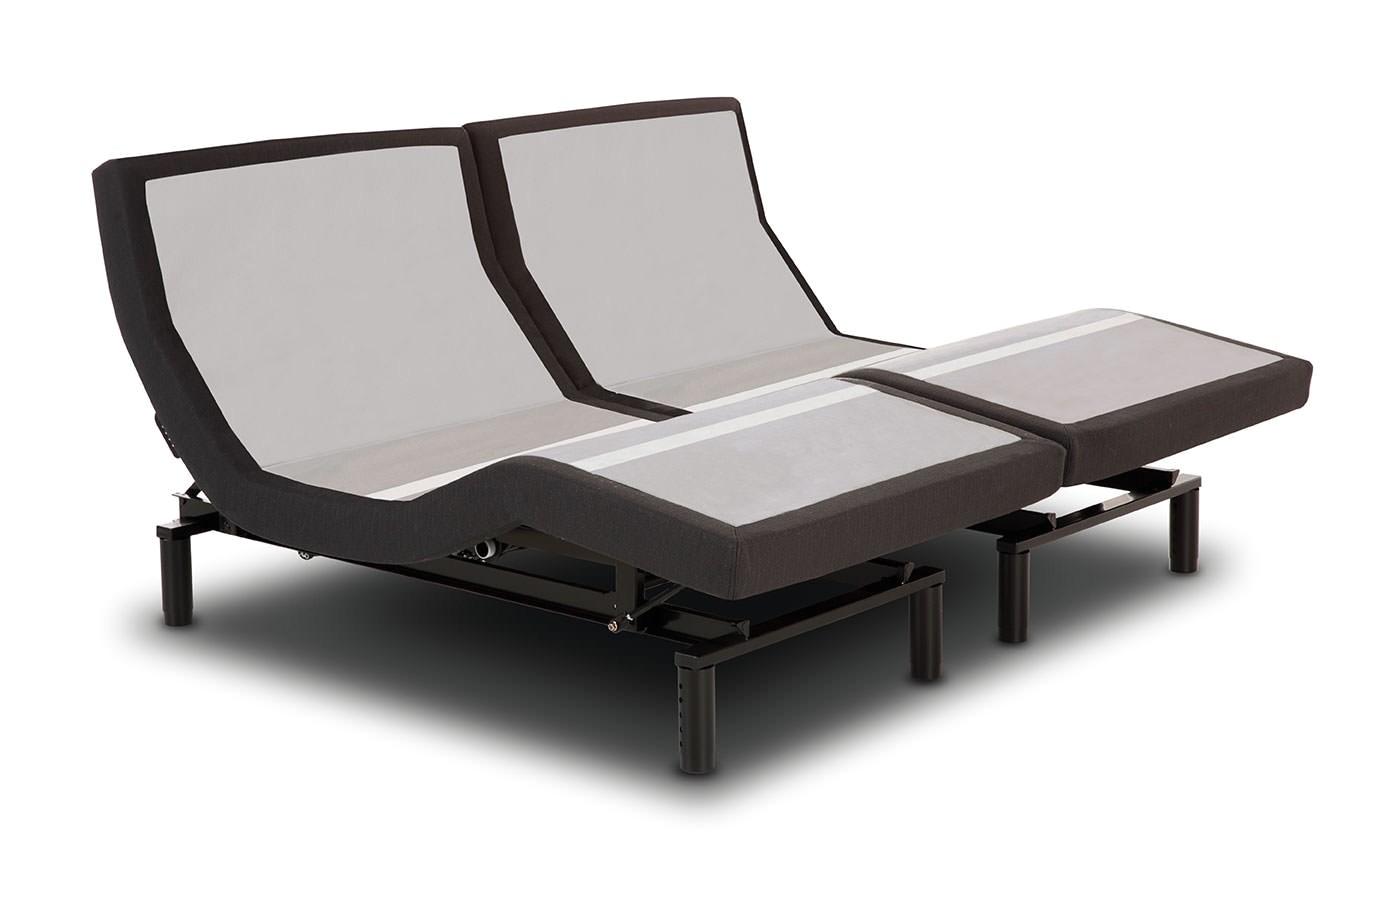 ergo star invincible adjustable bed